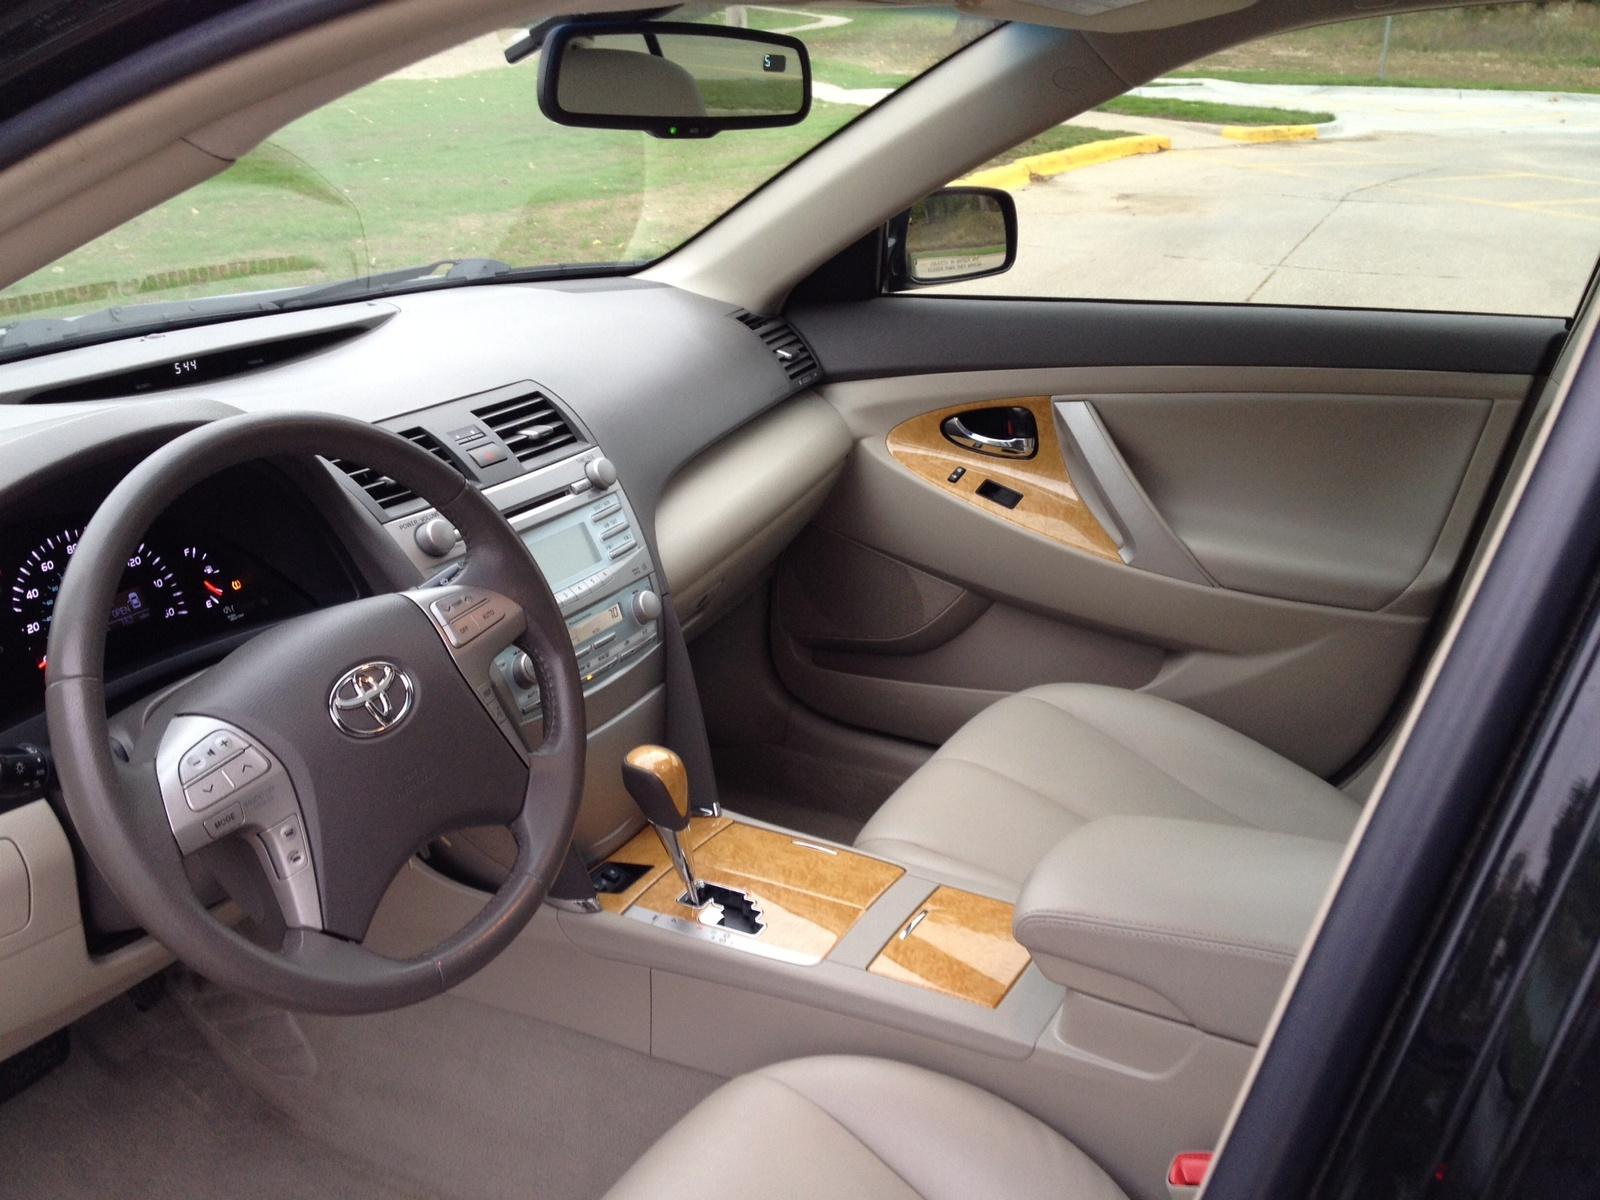 2007 Toyota Camry Pictures Cargurus